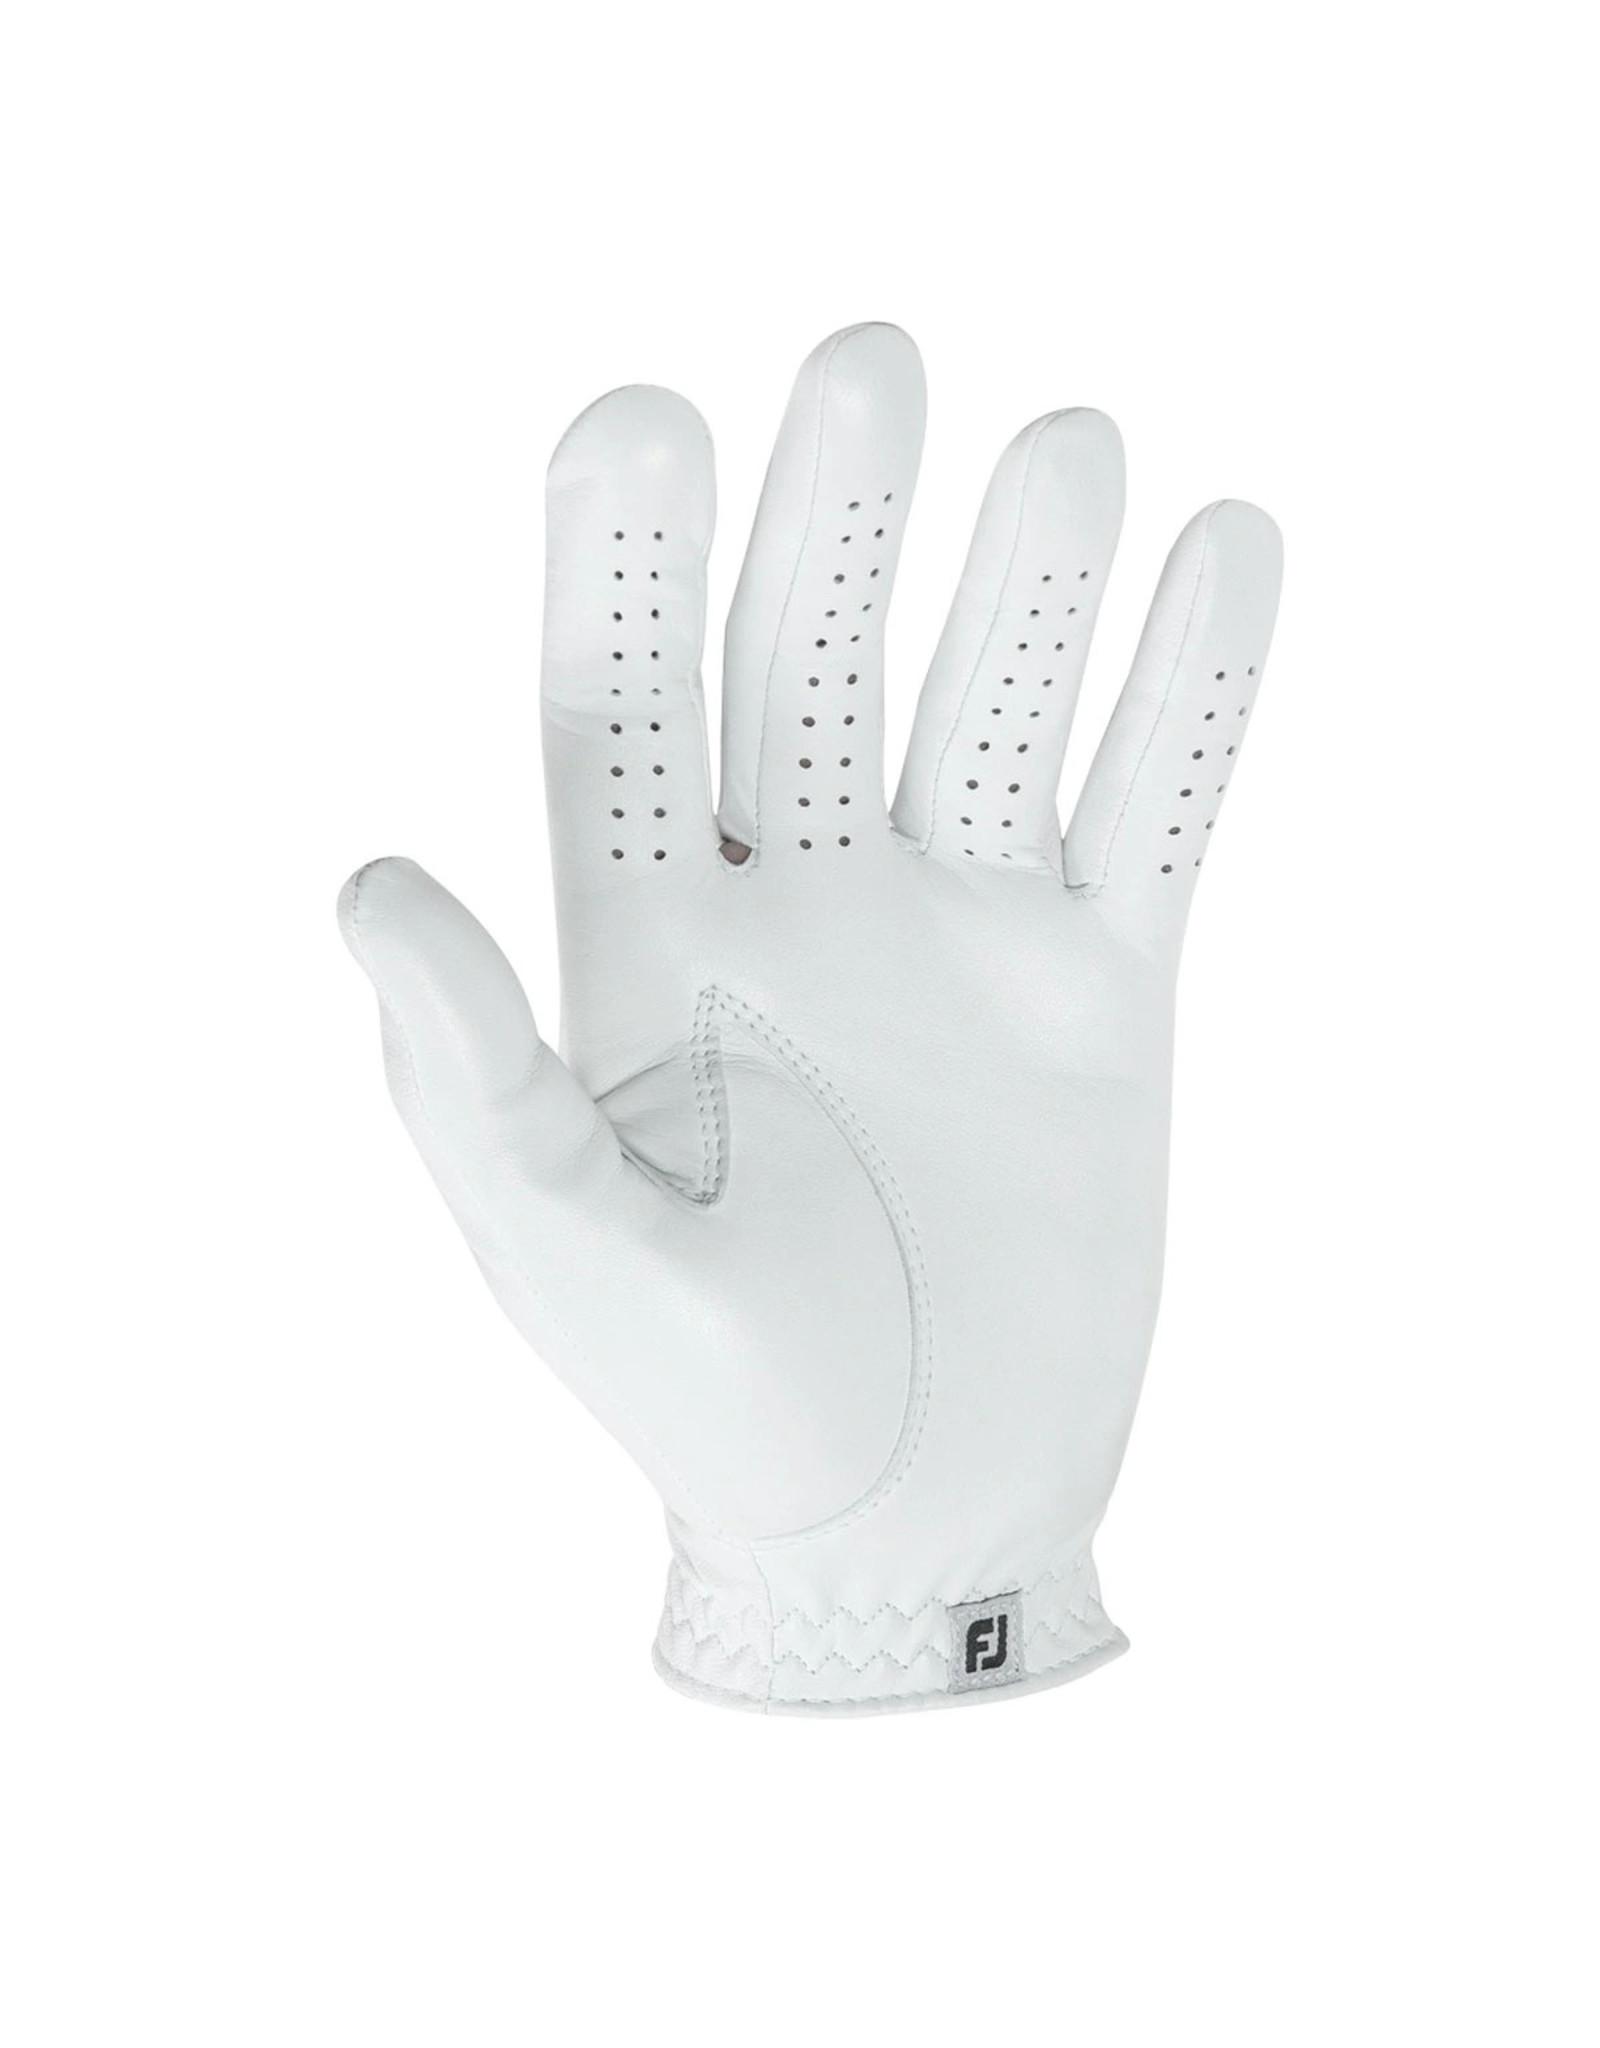 FootJoy FootJoy Contour FLX Men's Glove